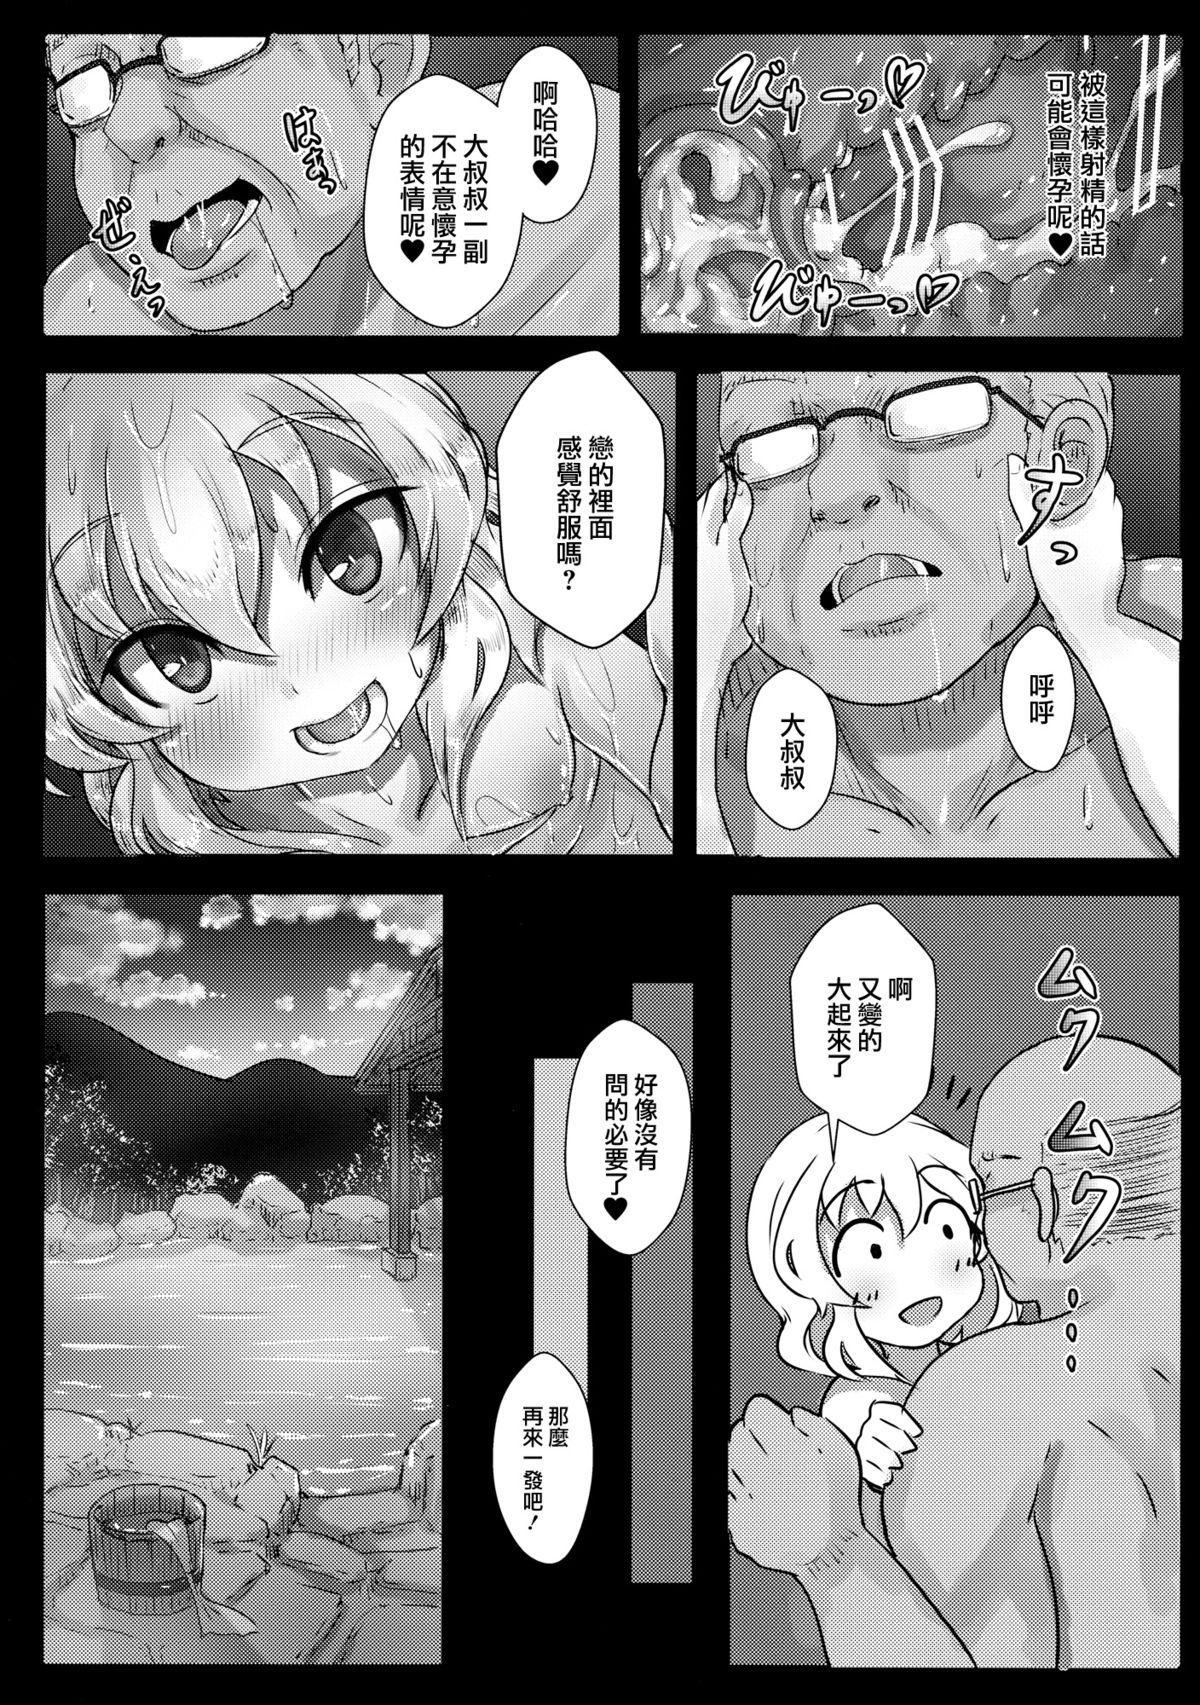 Koishi-chan no Ecchi na Mainichi 10